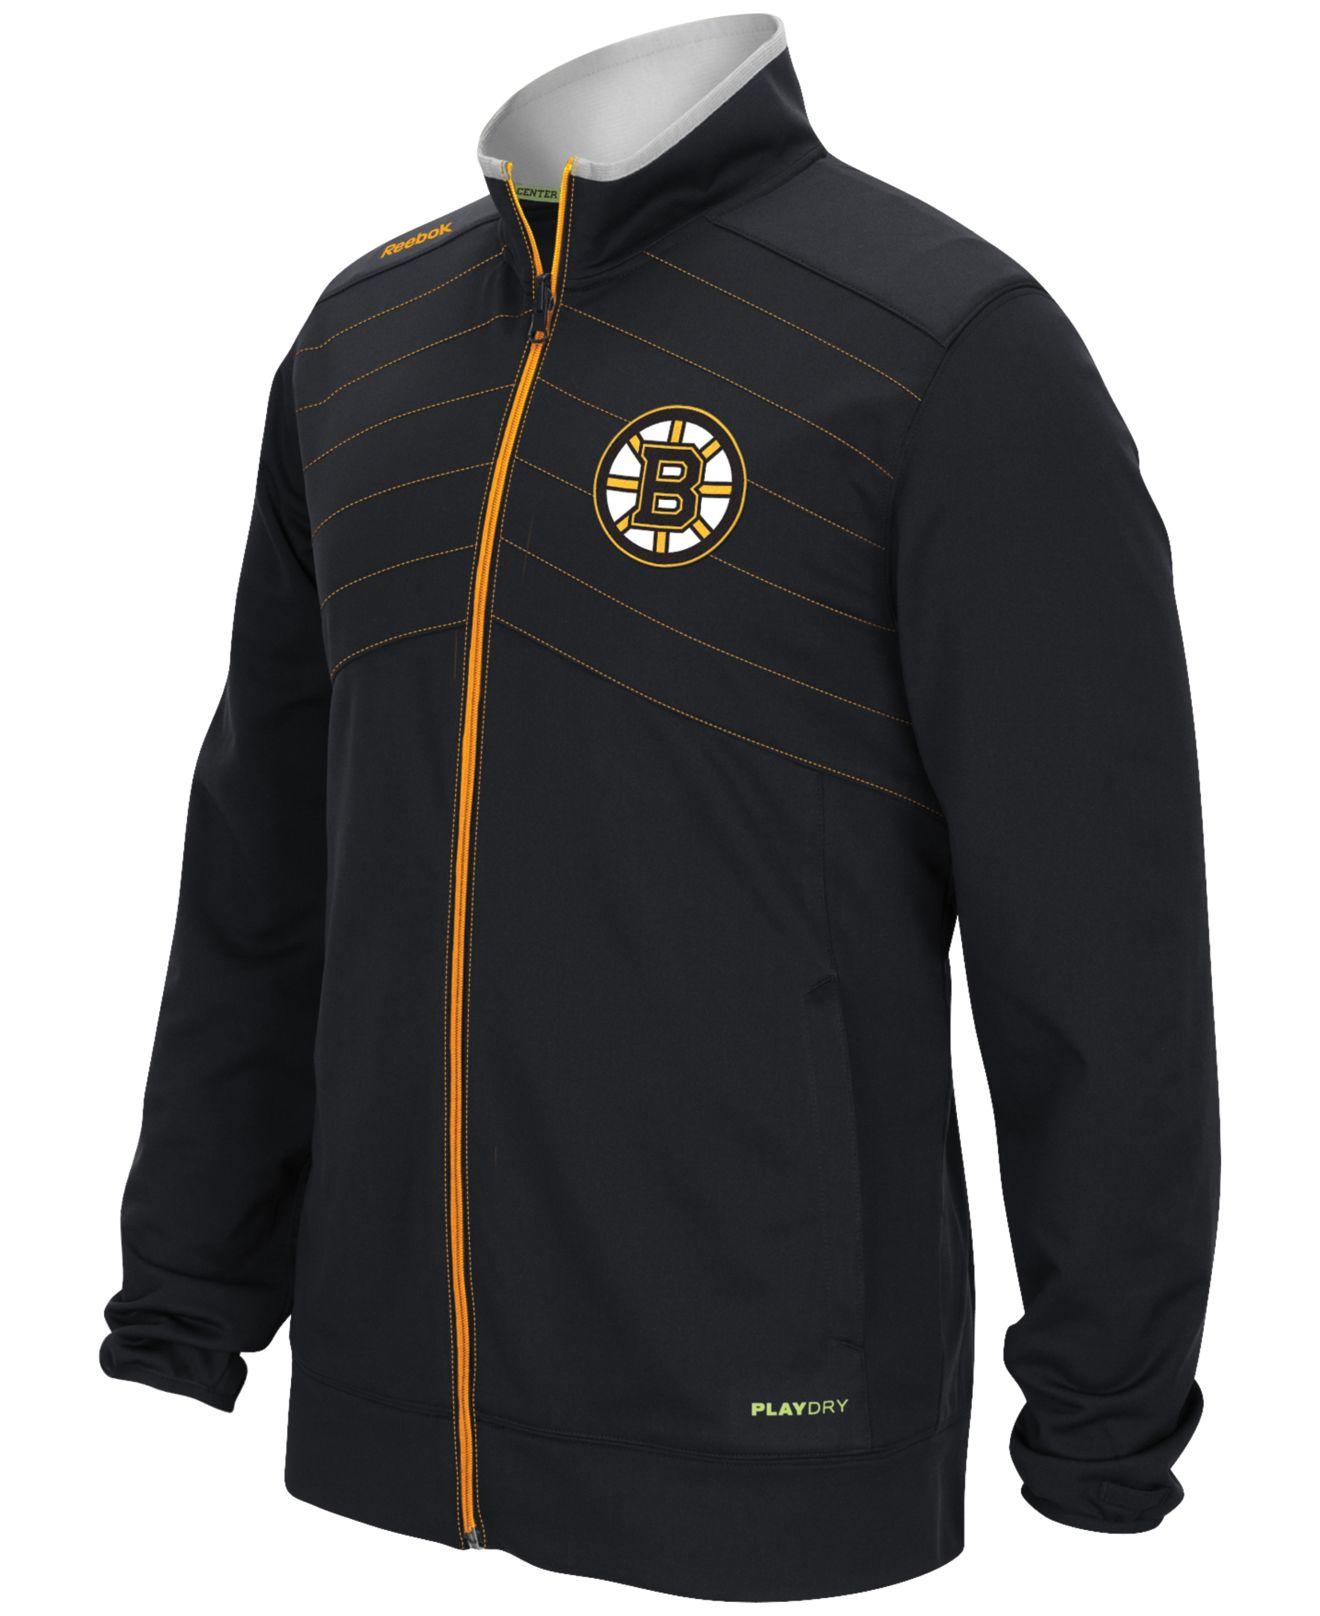 0895fcfecfda3 Reebok Men's Boston Bruins Center Ice Warm Up Jacket in Black for ...